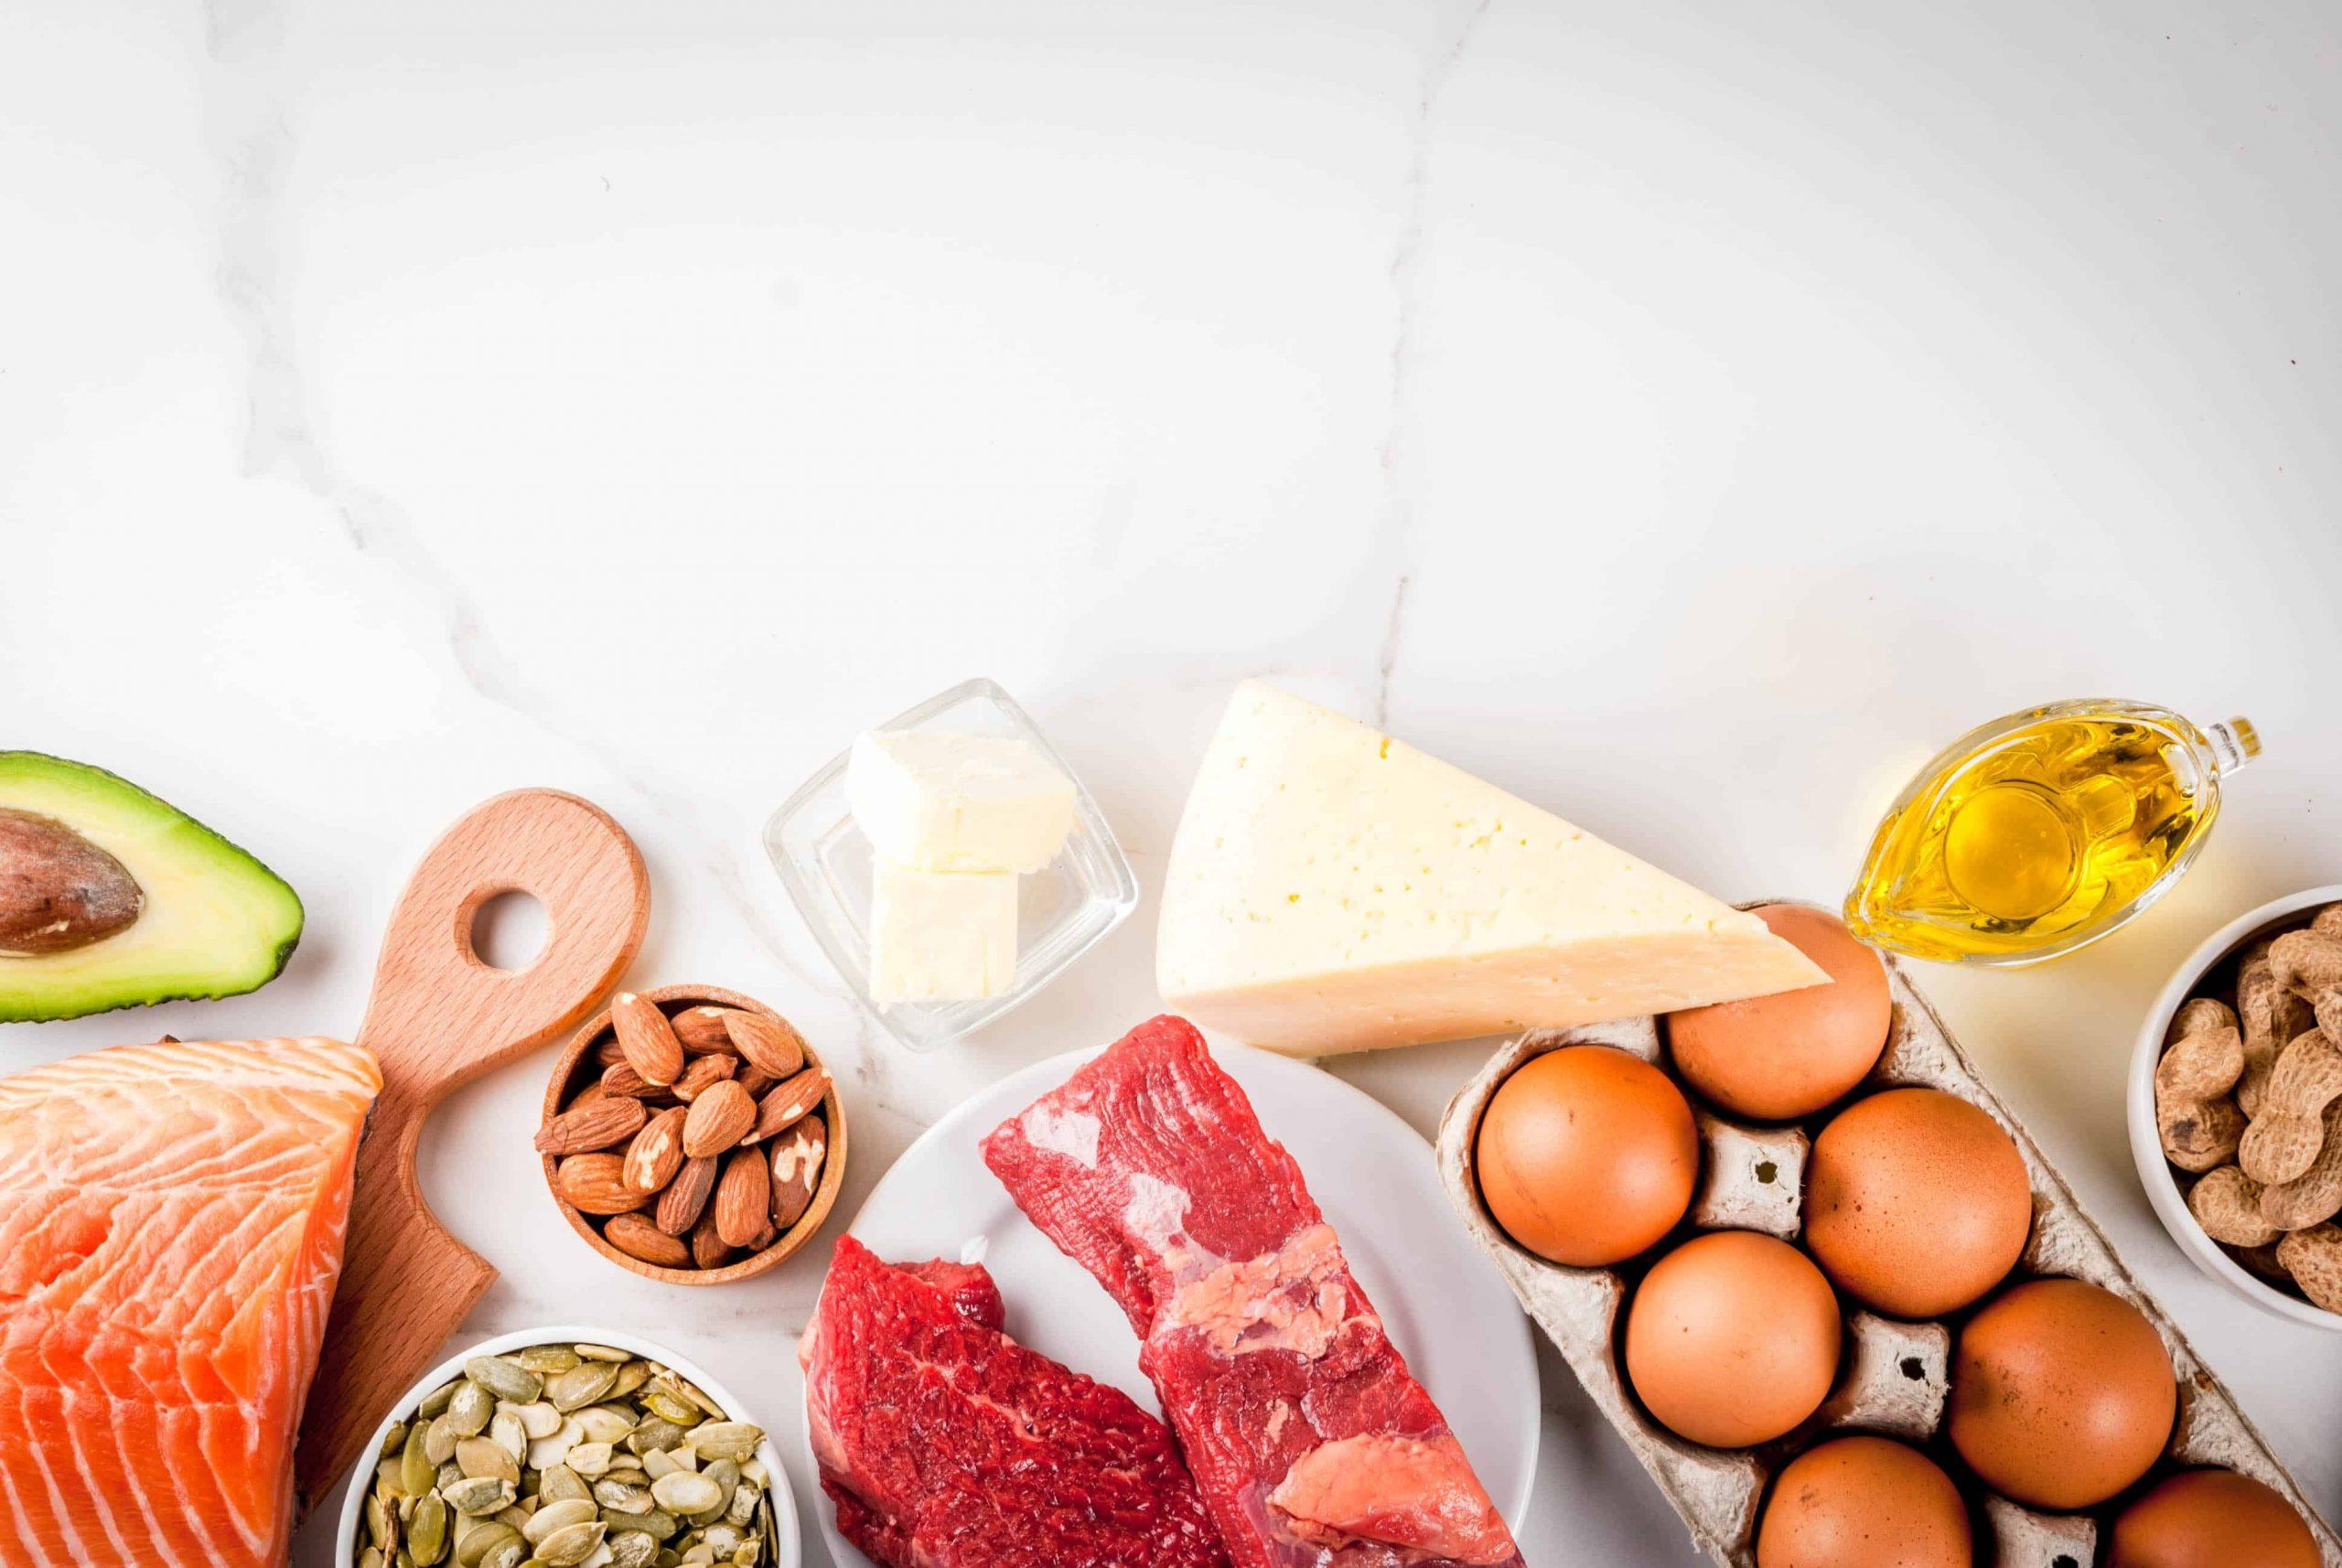 Atkins-Diät: Alles zum Abnehmen mit dem Low-Carb-Prinzip